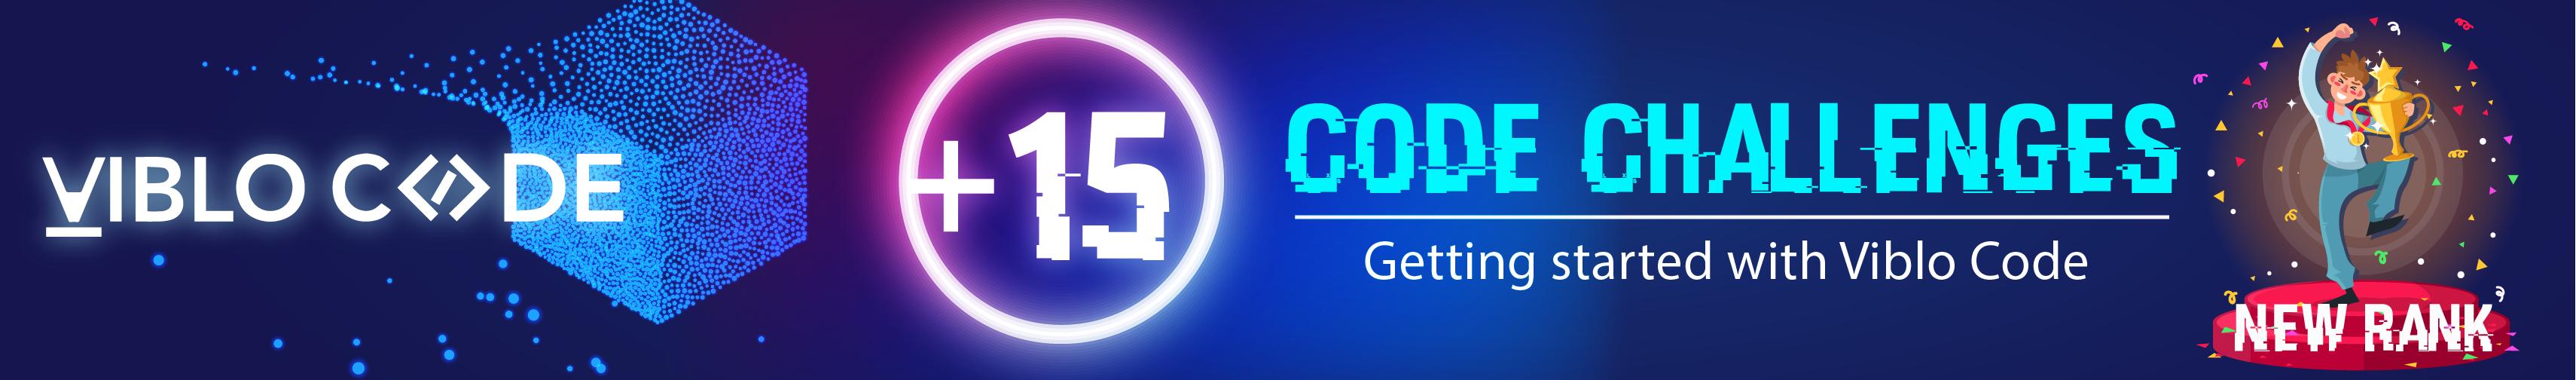 Viblo Code - New Challenge 202010